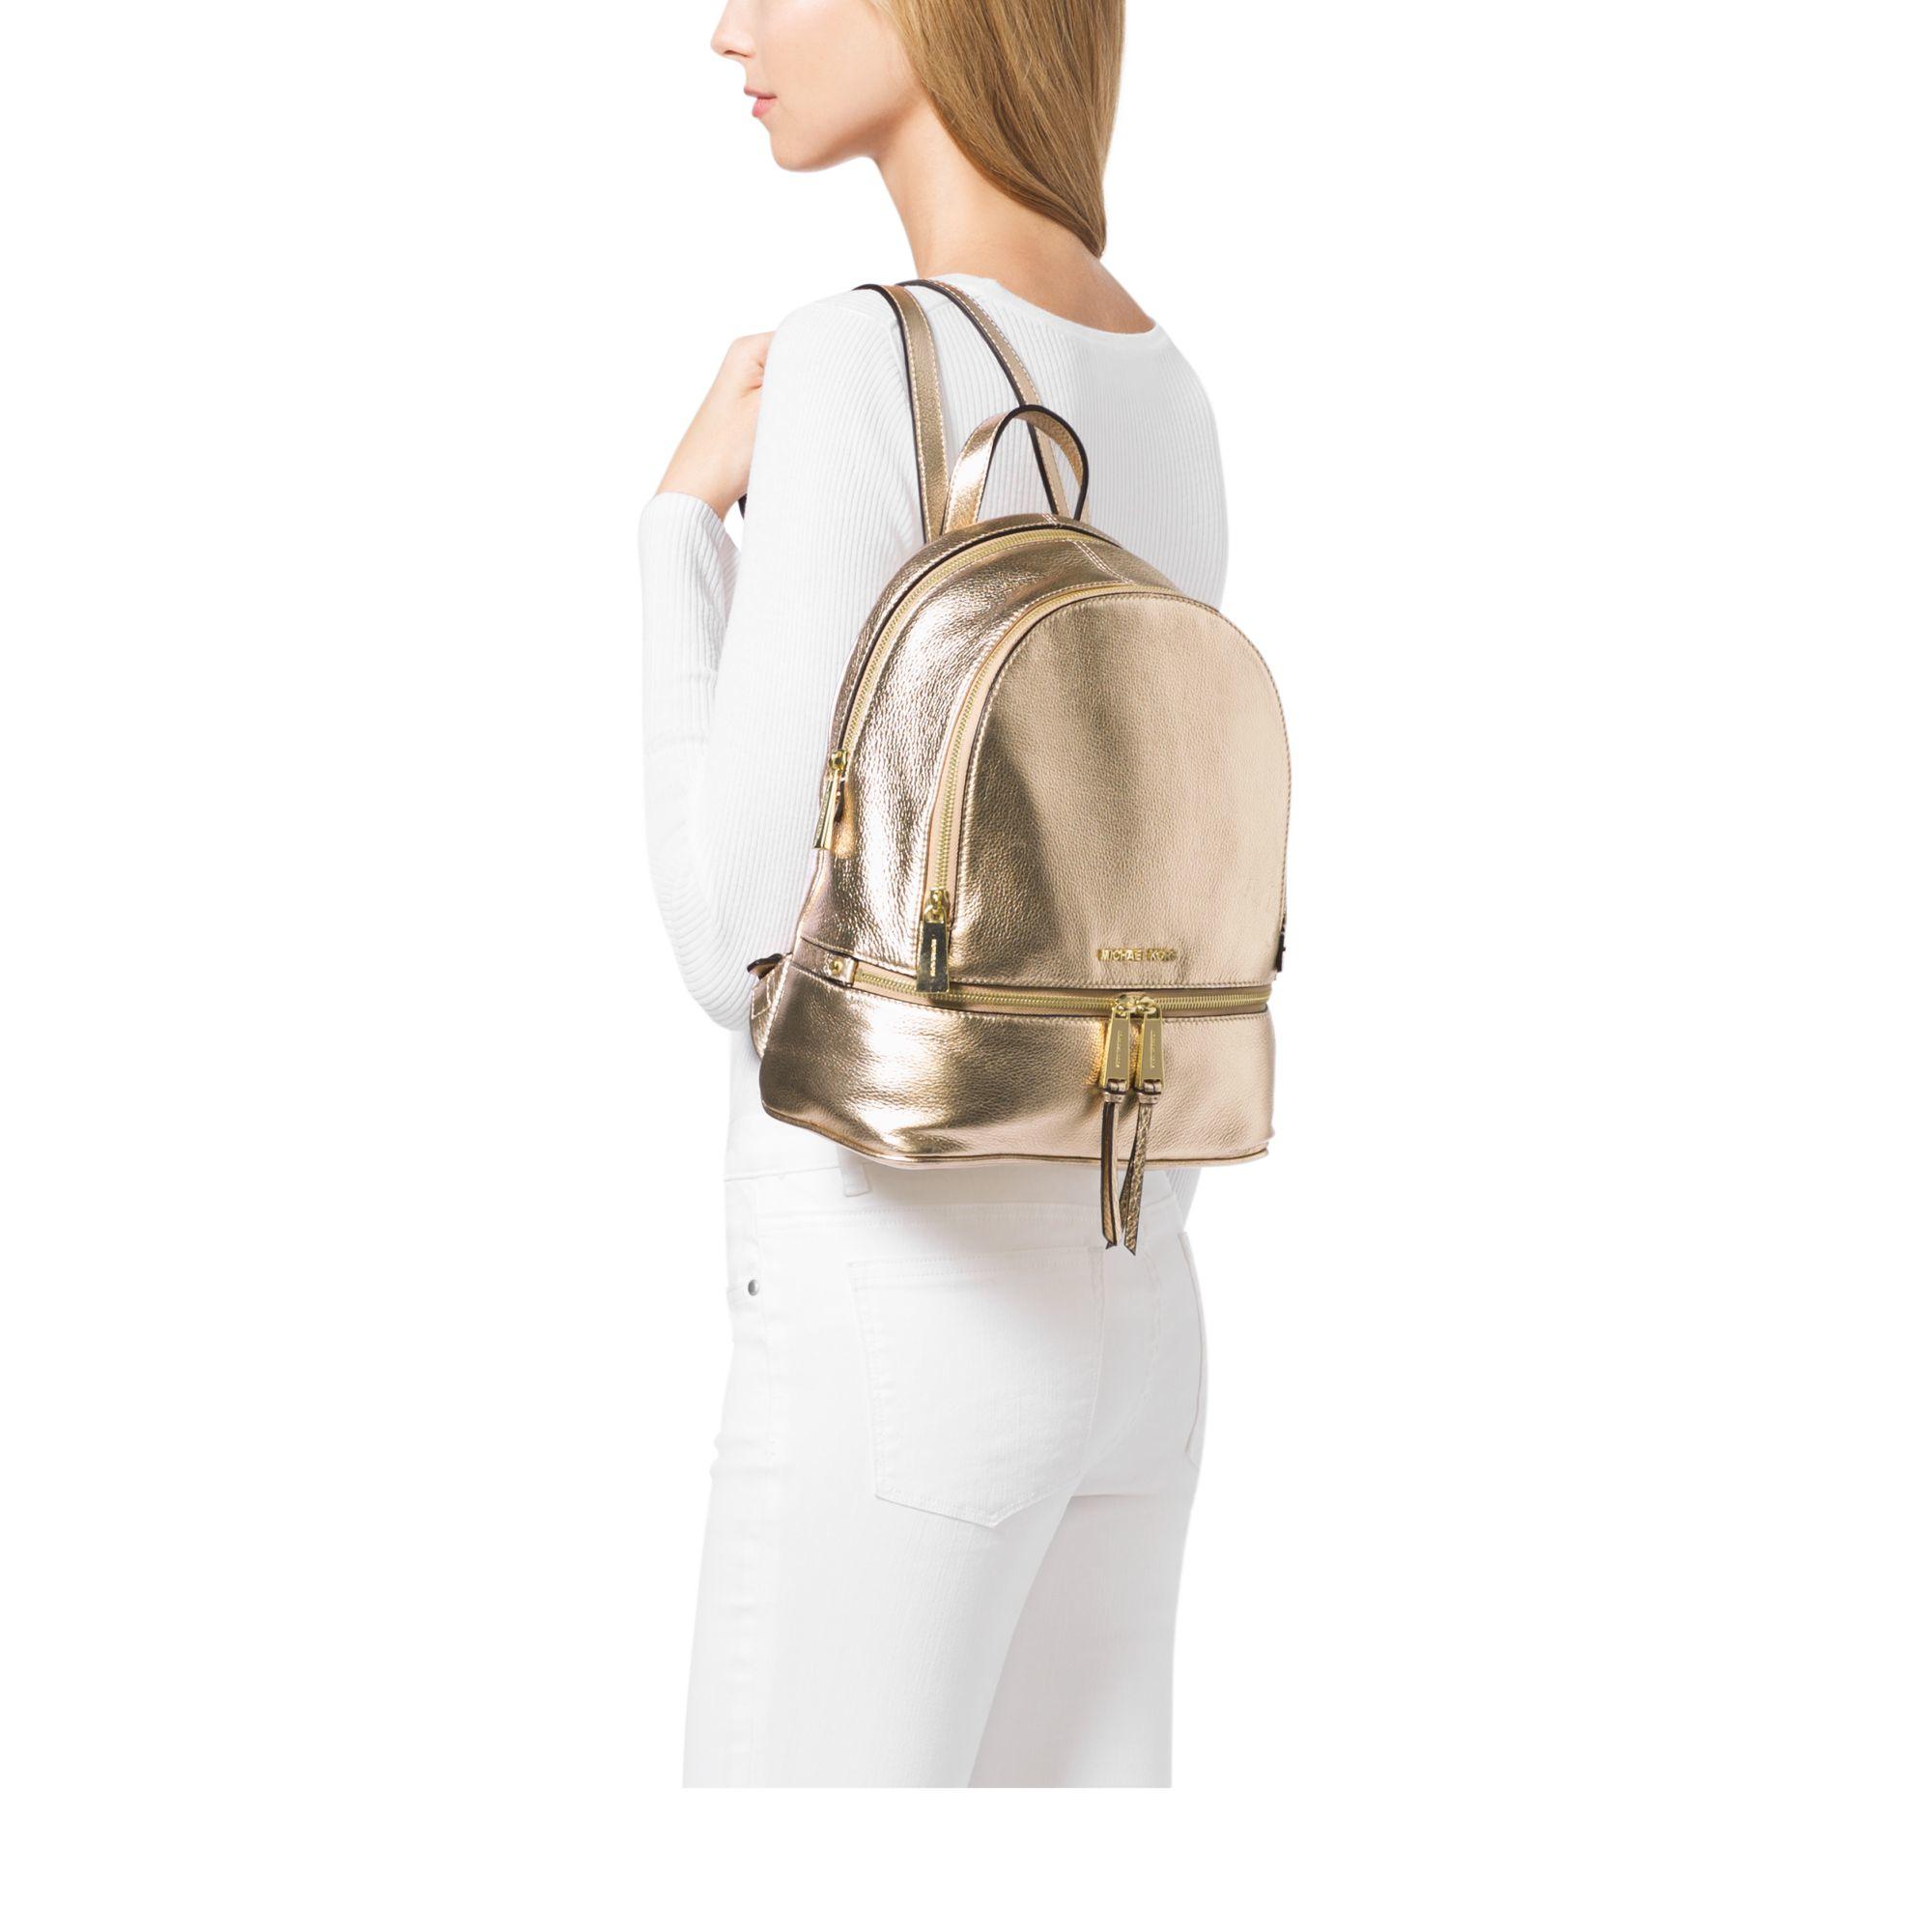 c6a95053b5f0 michael kors backpacks medium black and gold bag